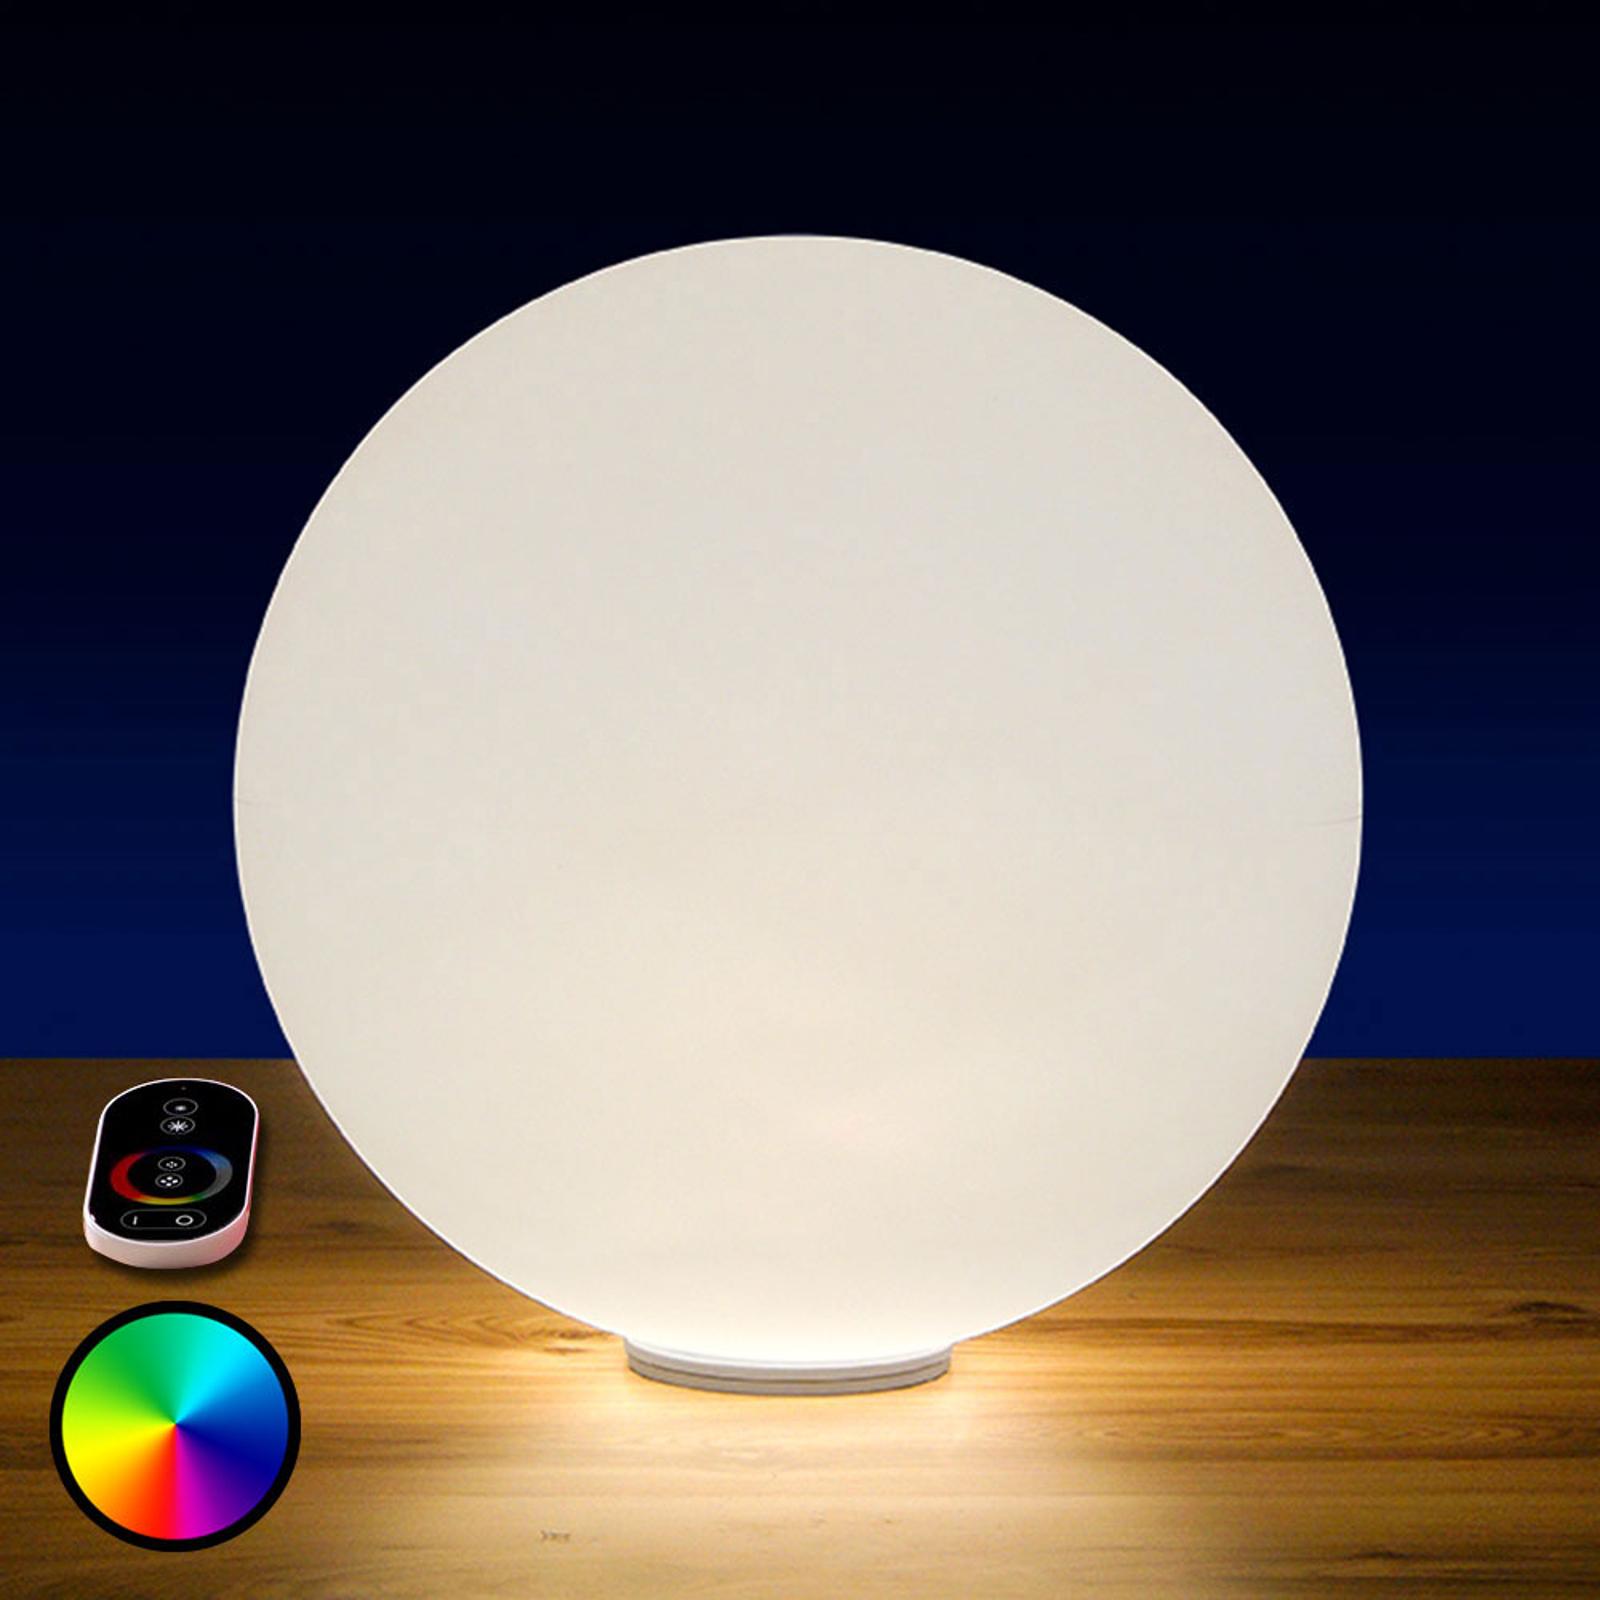 RGB-LED-kula Snowball för utomhus, batteri, 30 cm